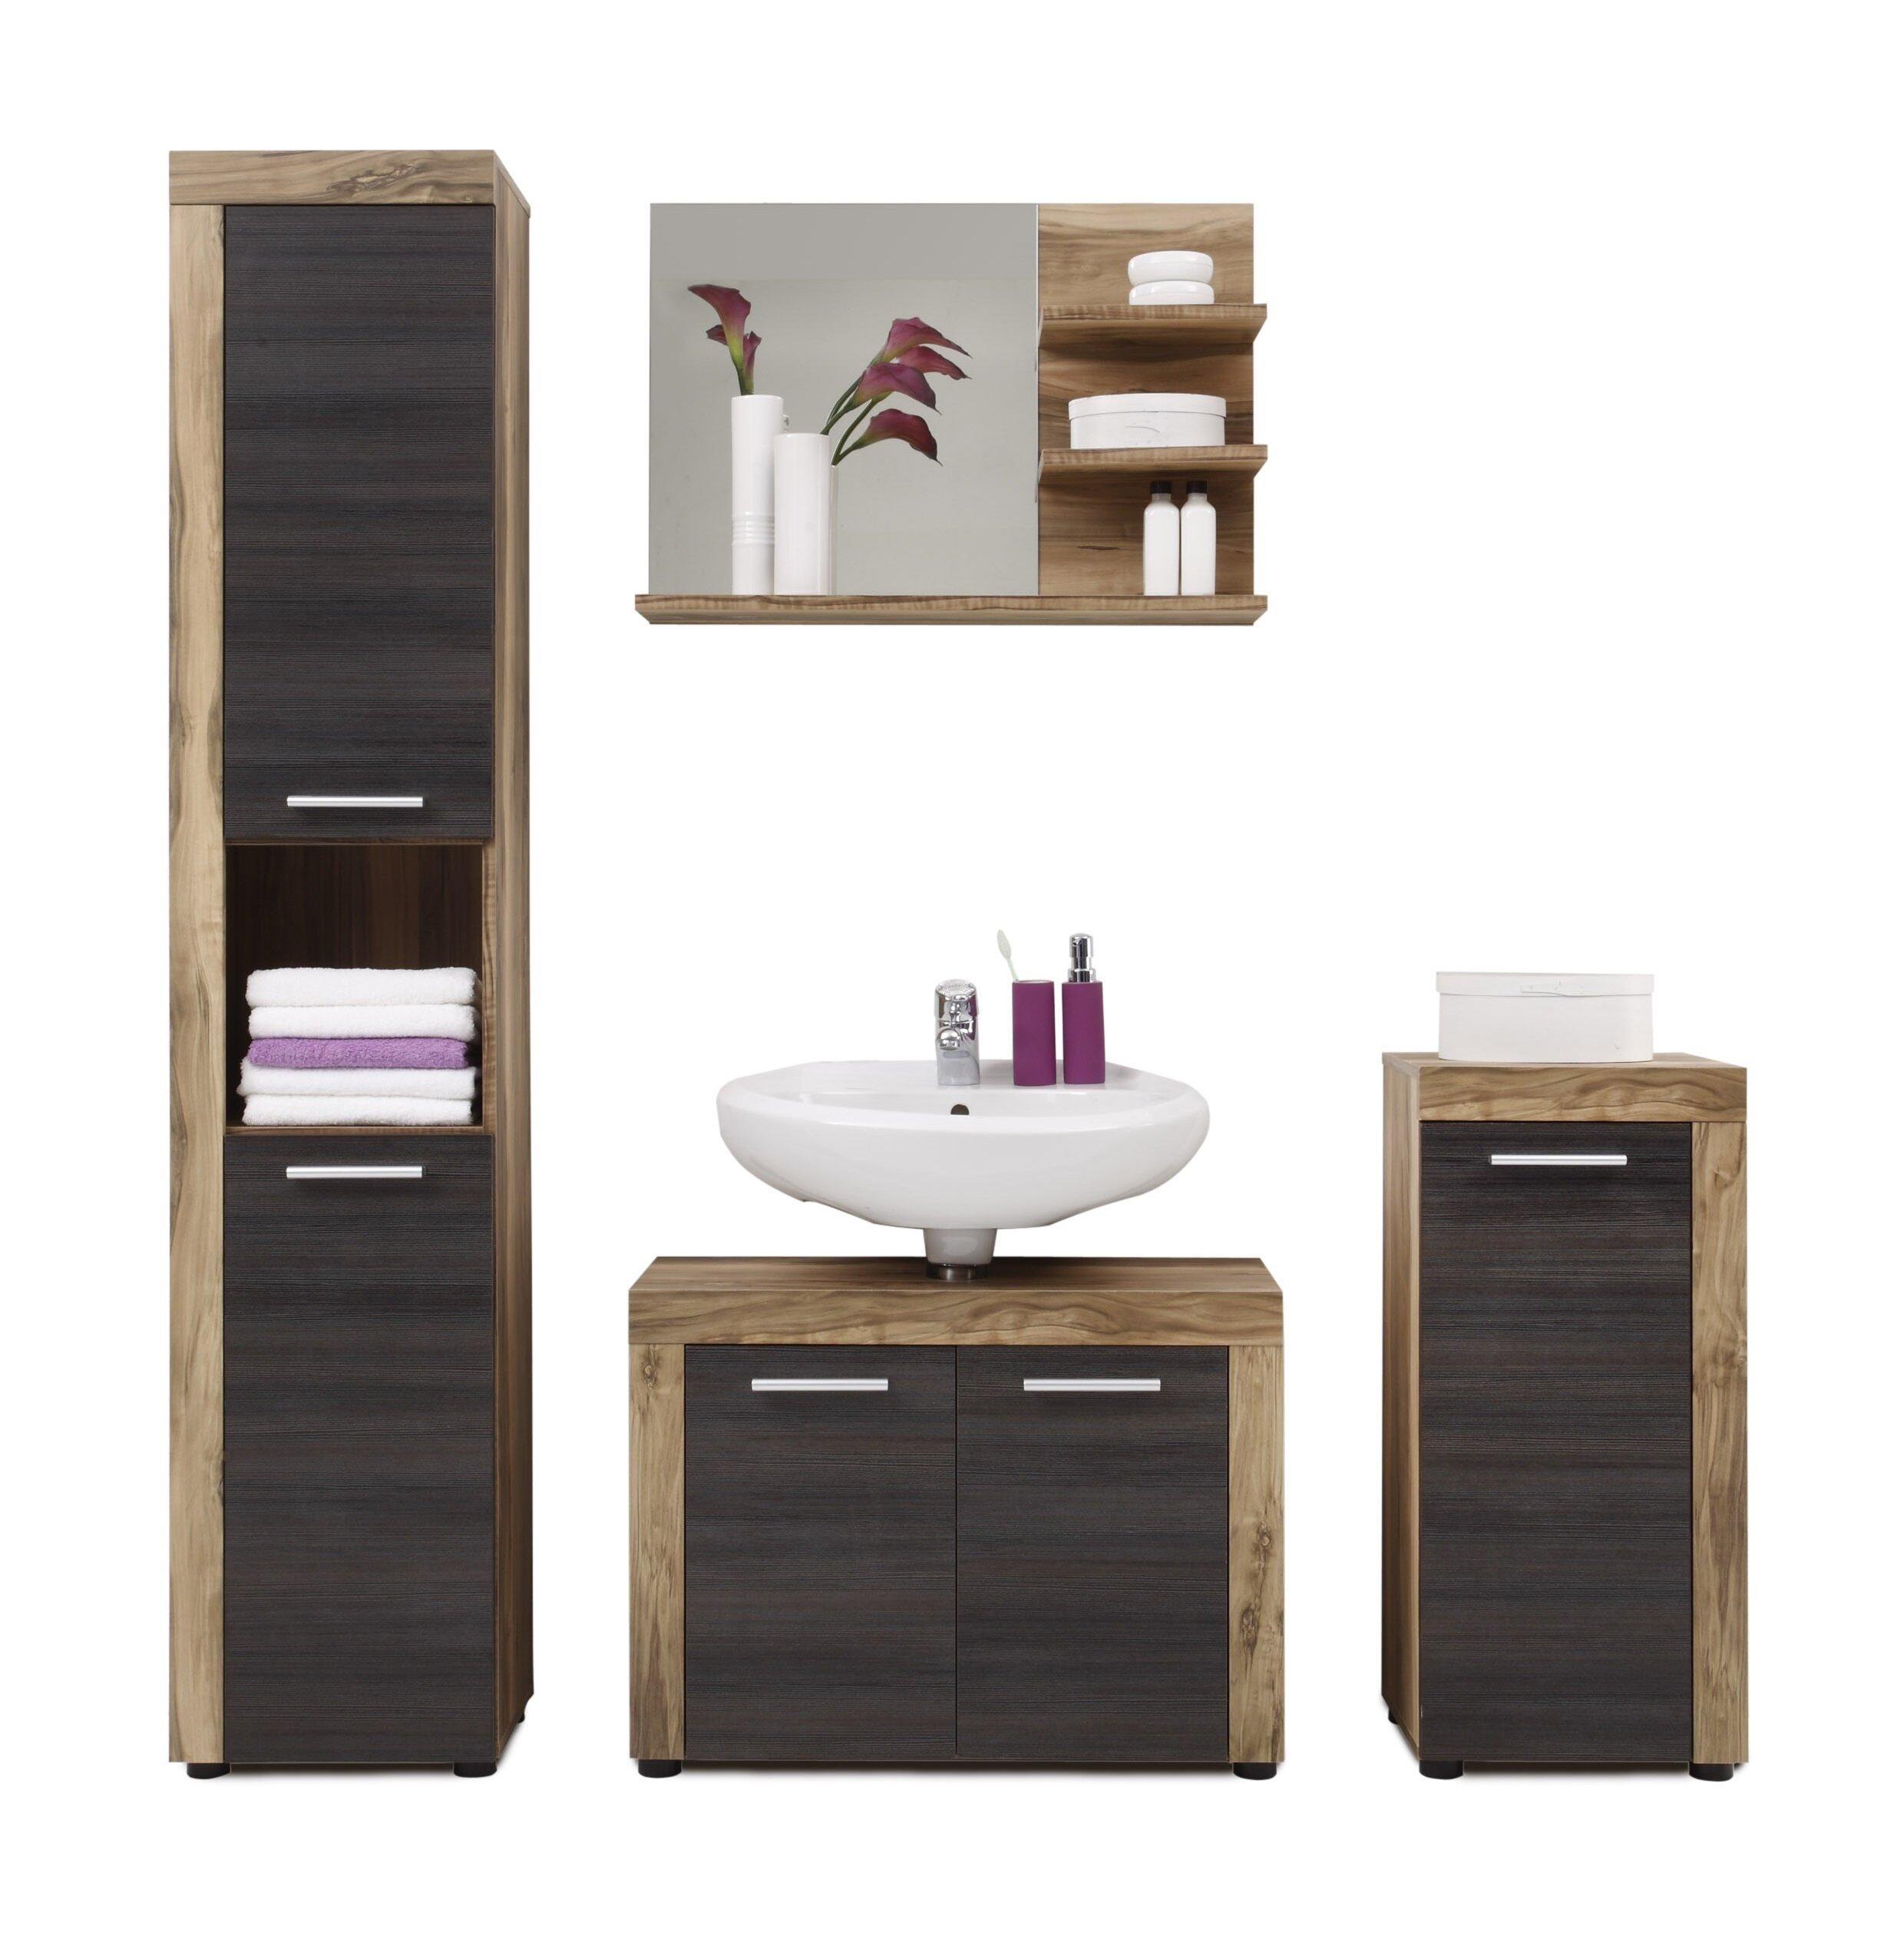 Partone 10 Piece Bathroom Storage Furniture Set